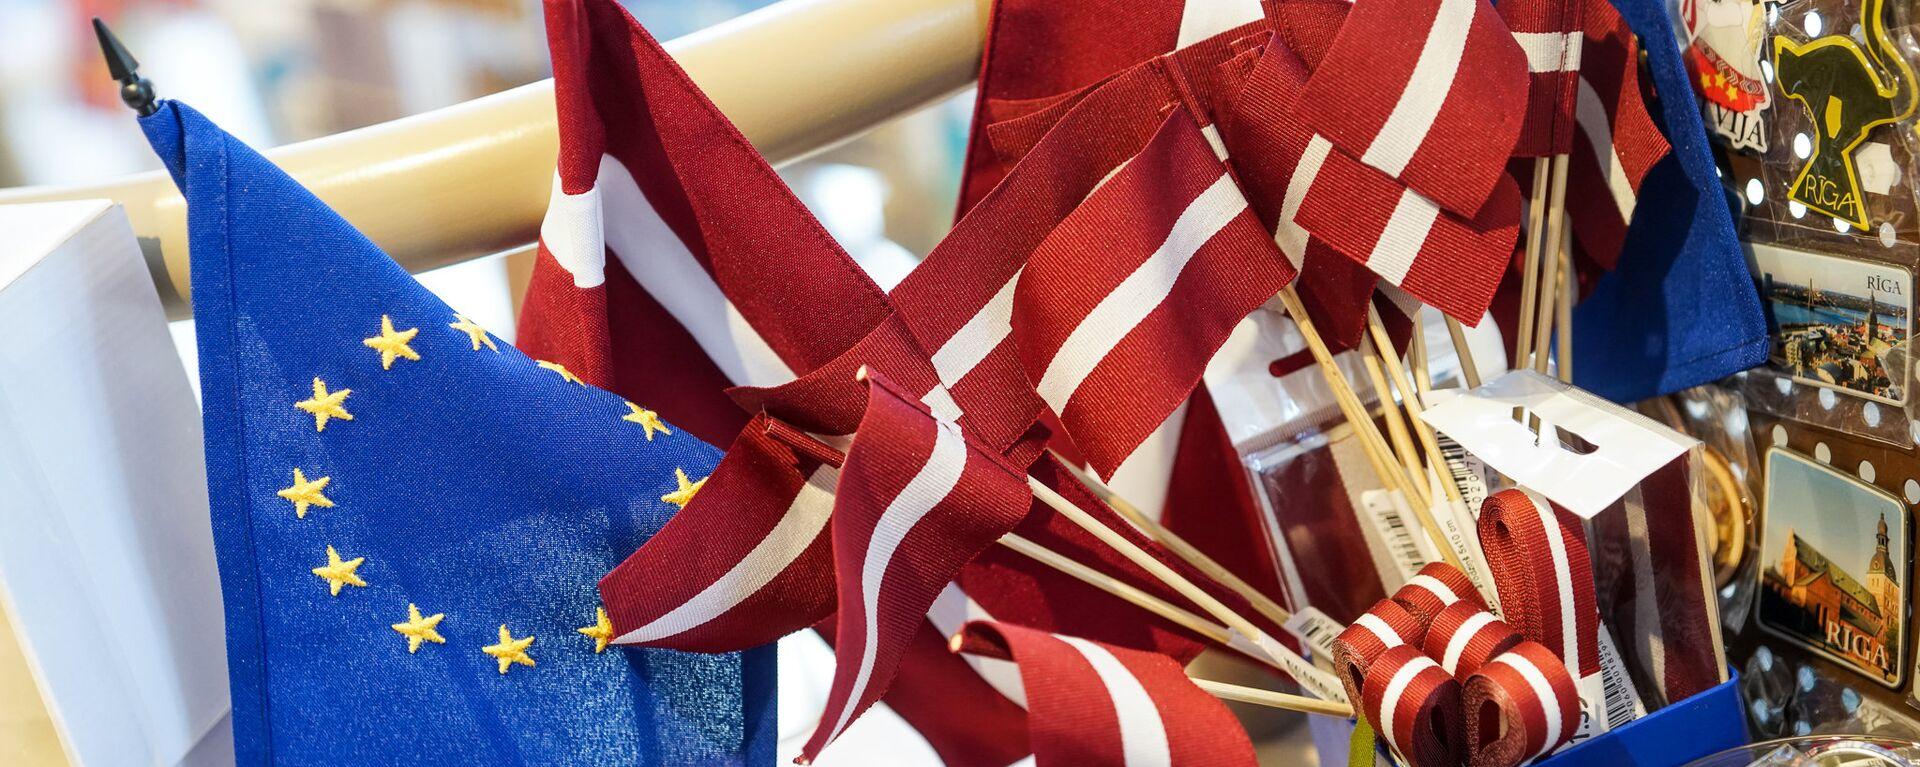 Флаги Латвии и ЕС - Sputnik Латвия, 1920, 13.08.2021